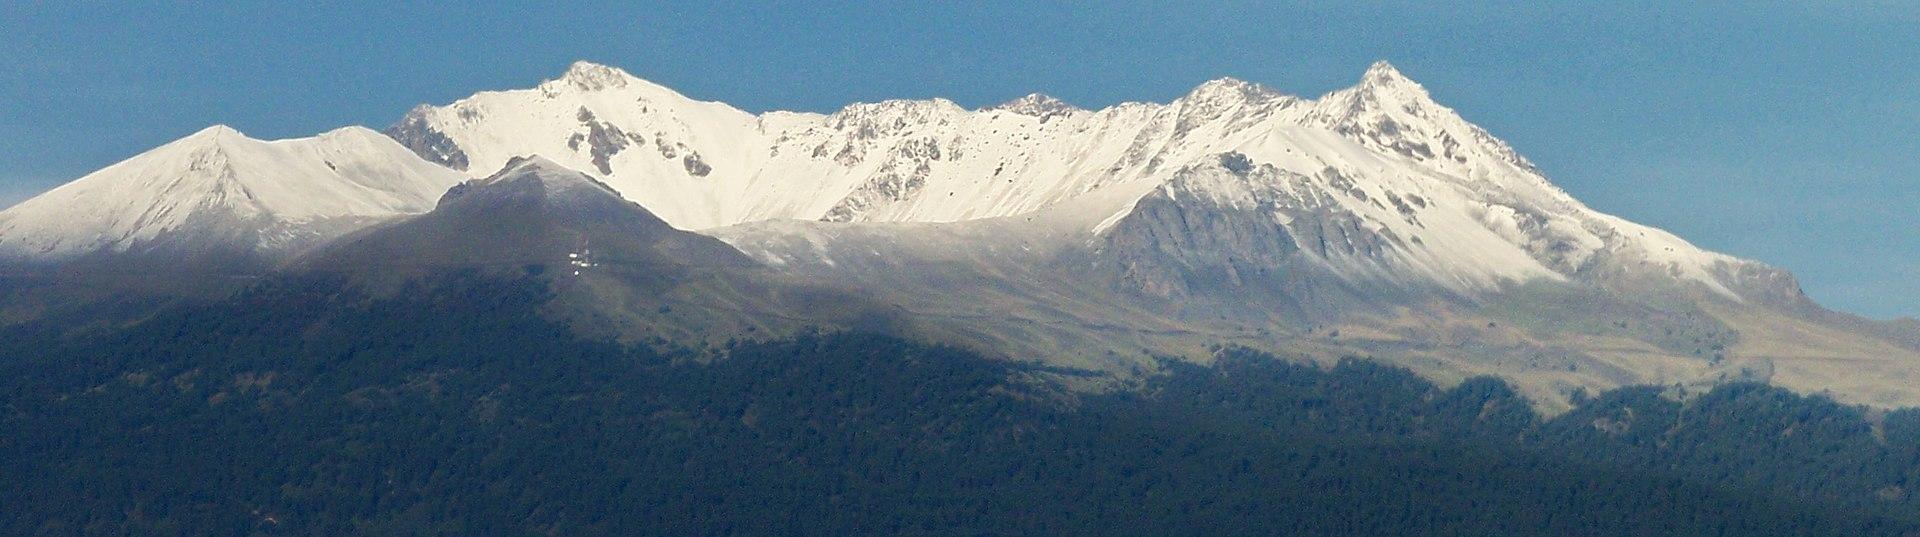 Nevado de Toluca Peak, December 2005.JPG